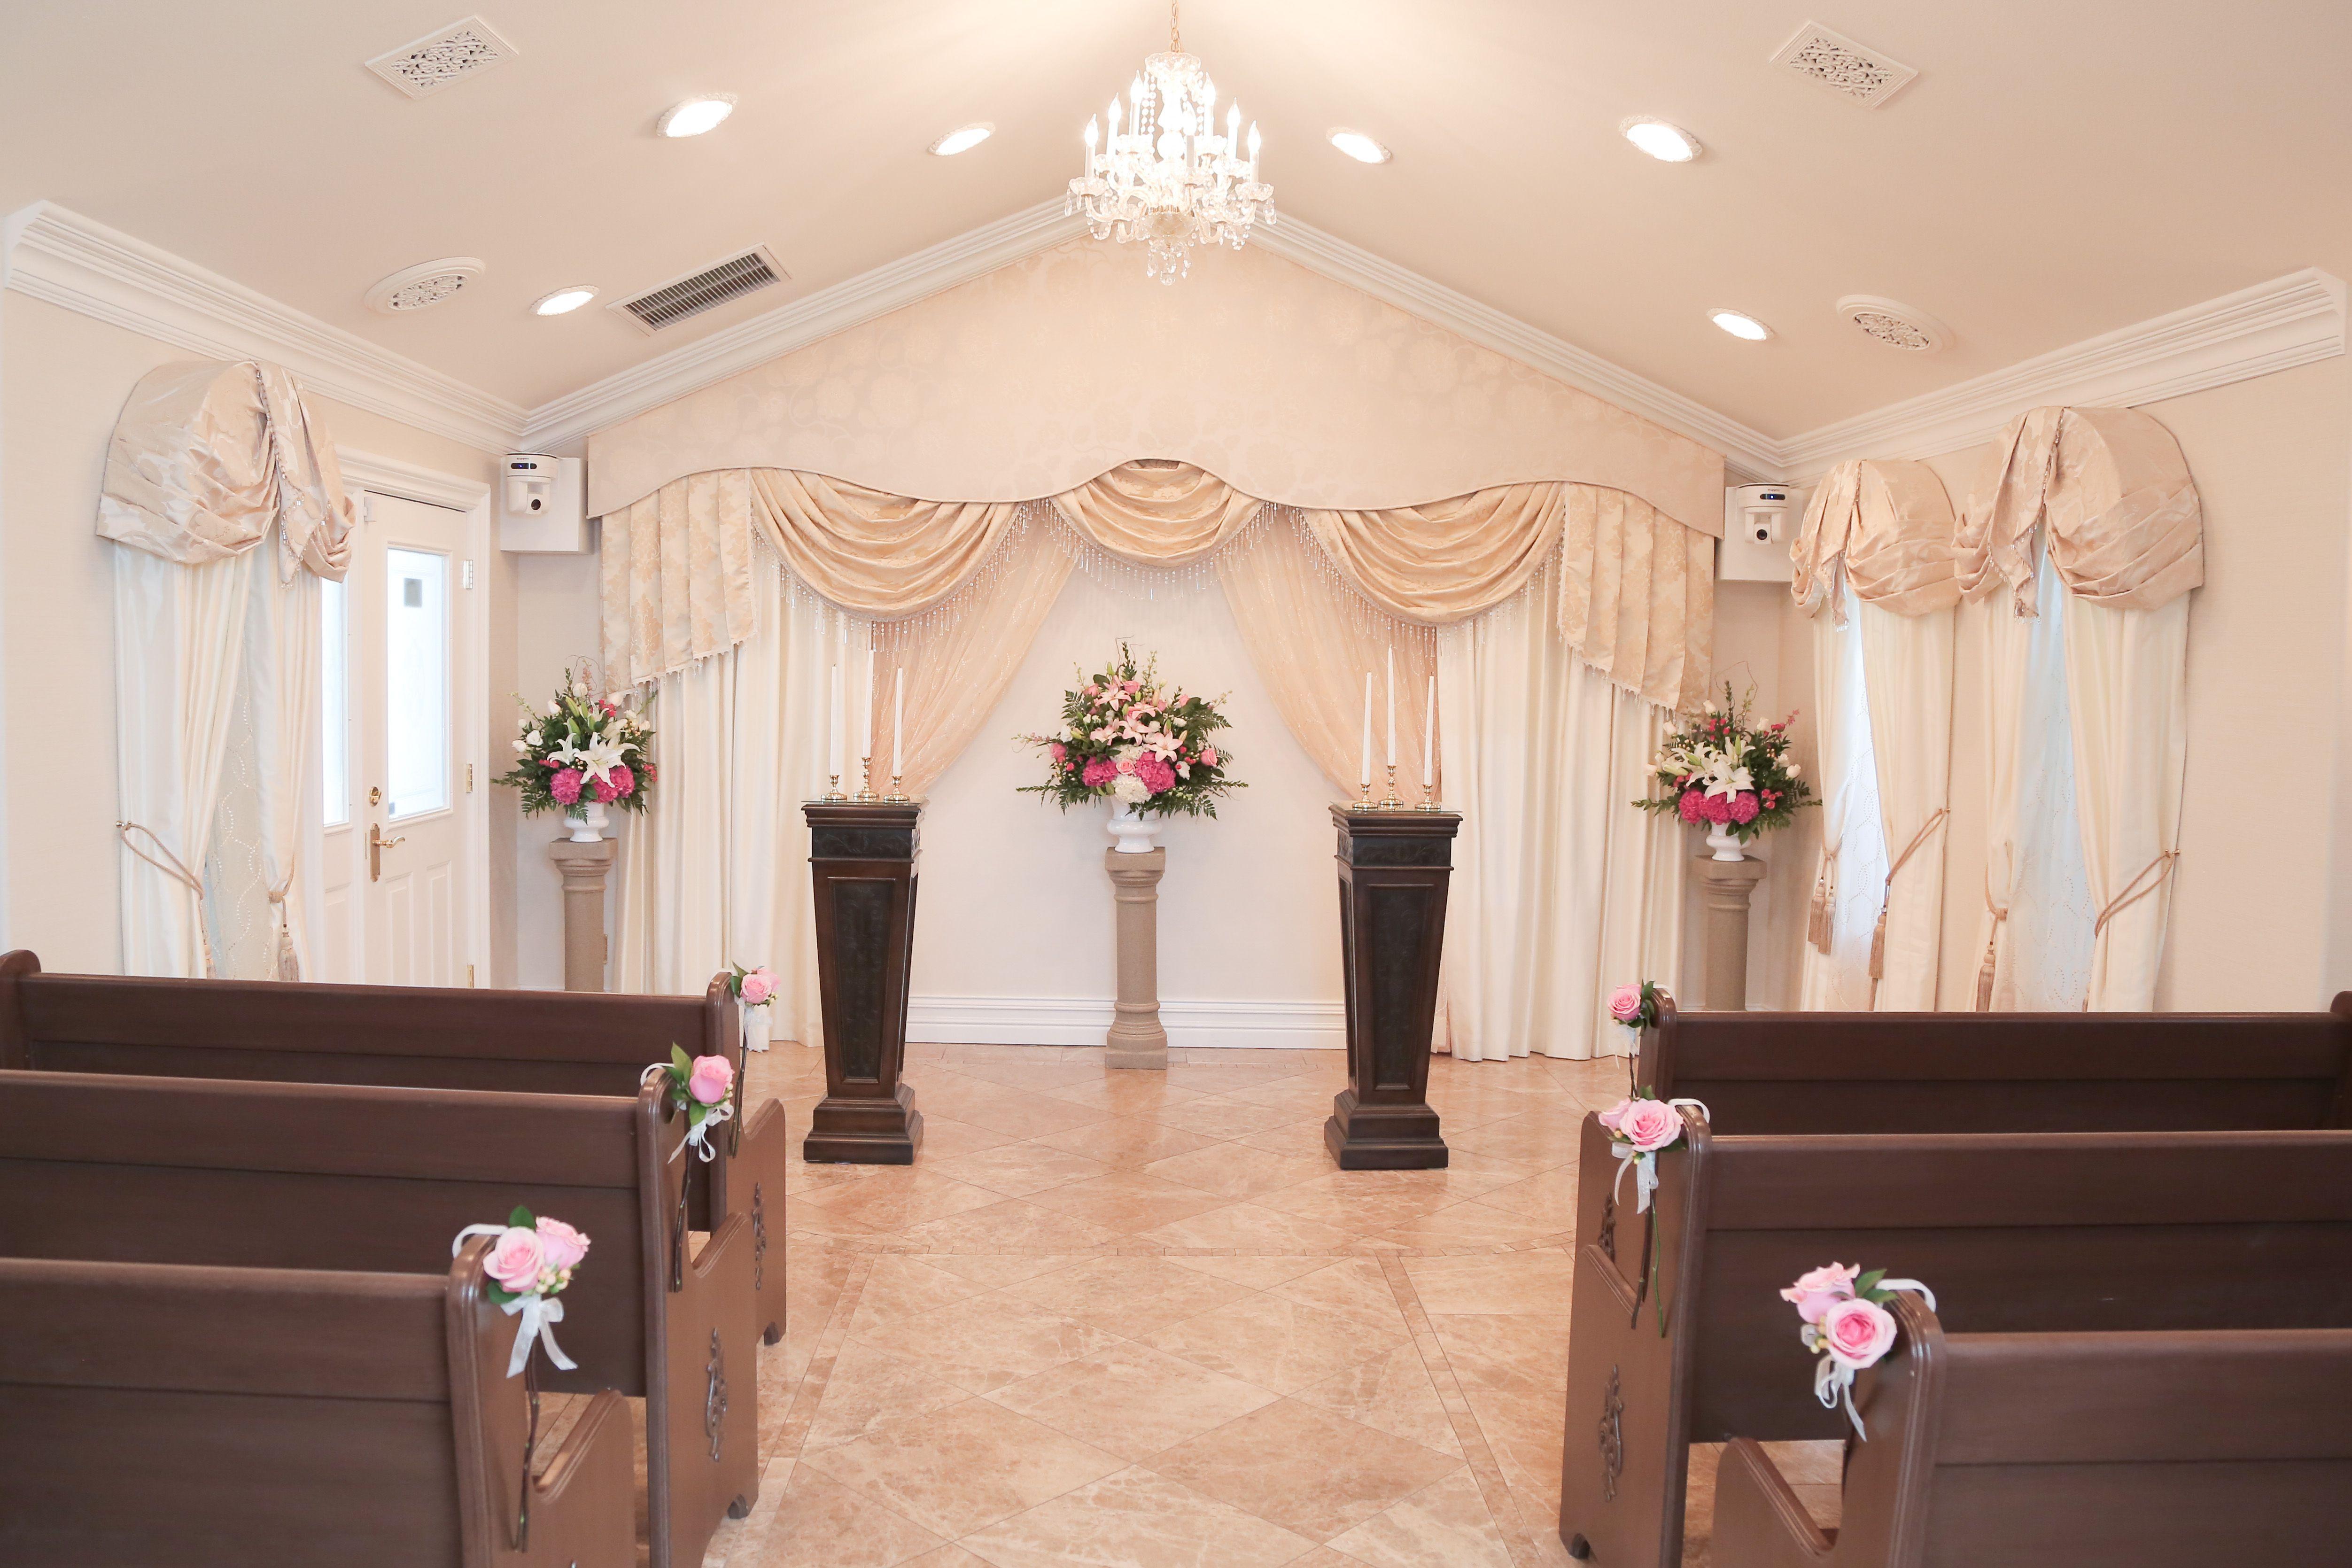 Las Vegas Weddings Wedding In Vegas Chapel Of The Flowers Las Vegas Weddings Vegas Wedding Vegas Wedding Chapel